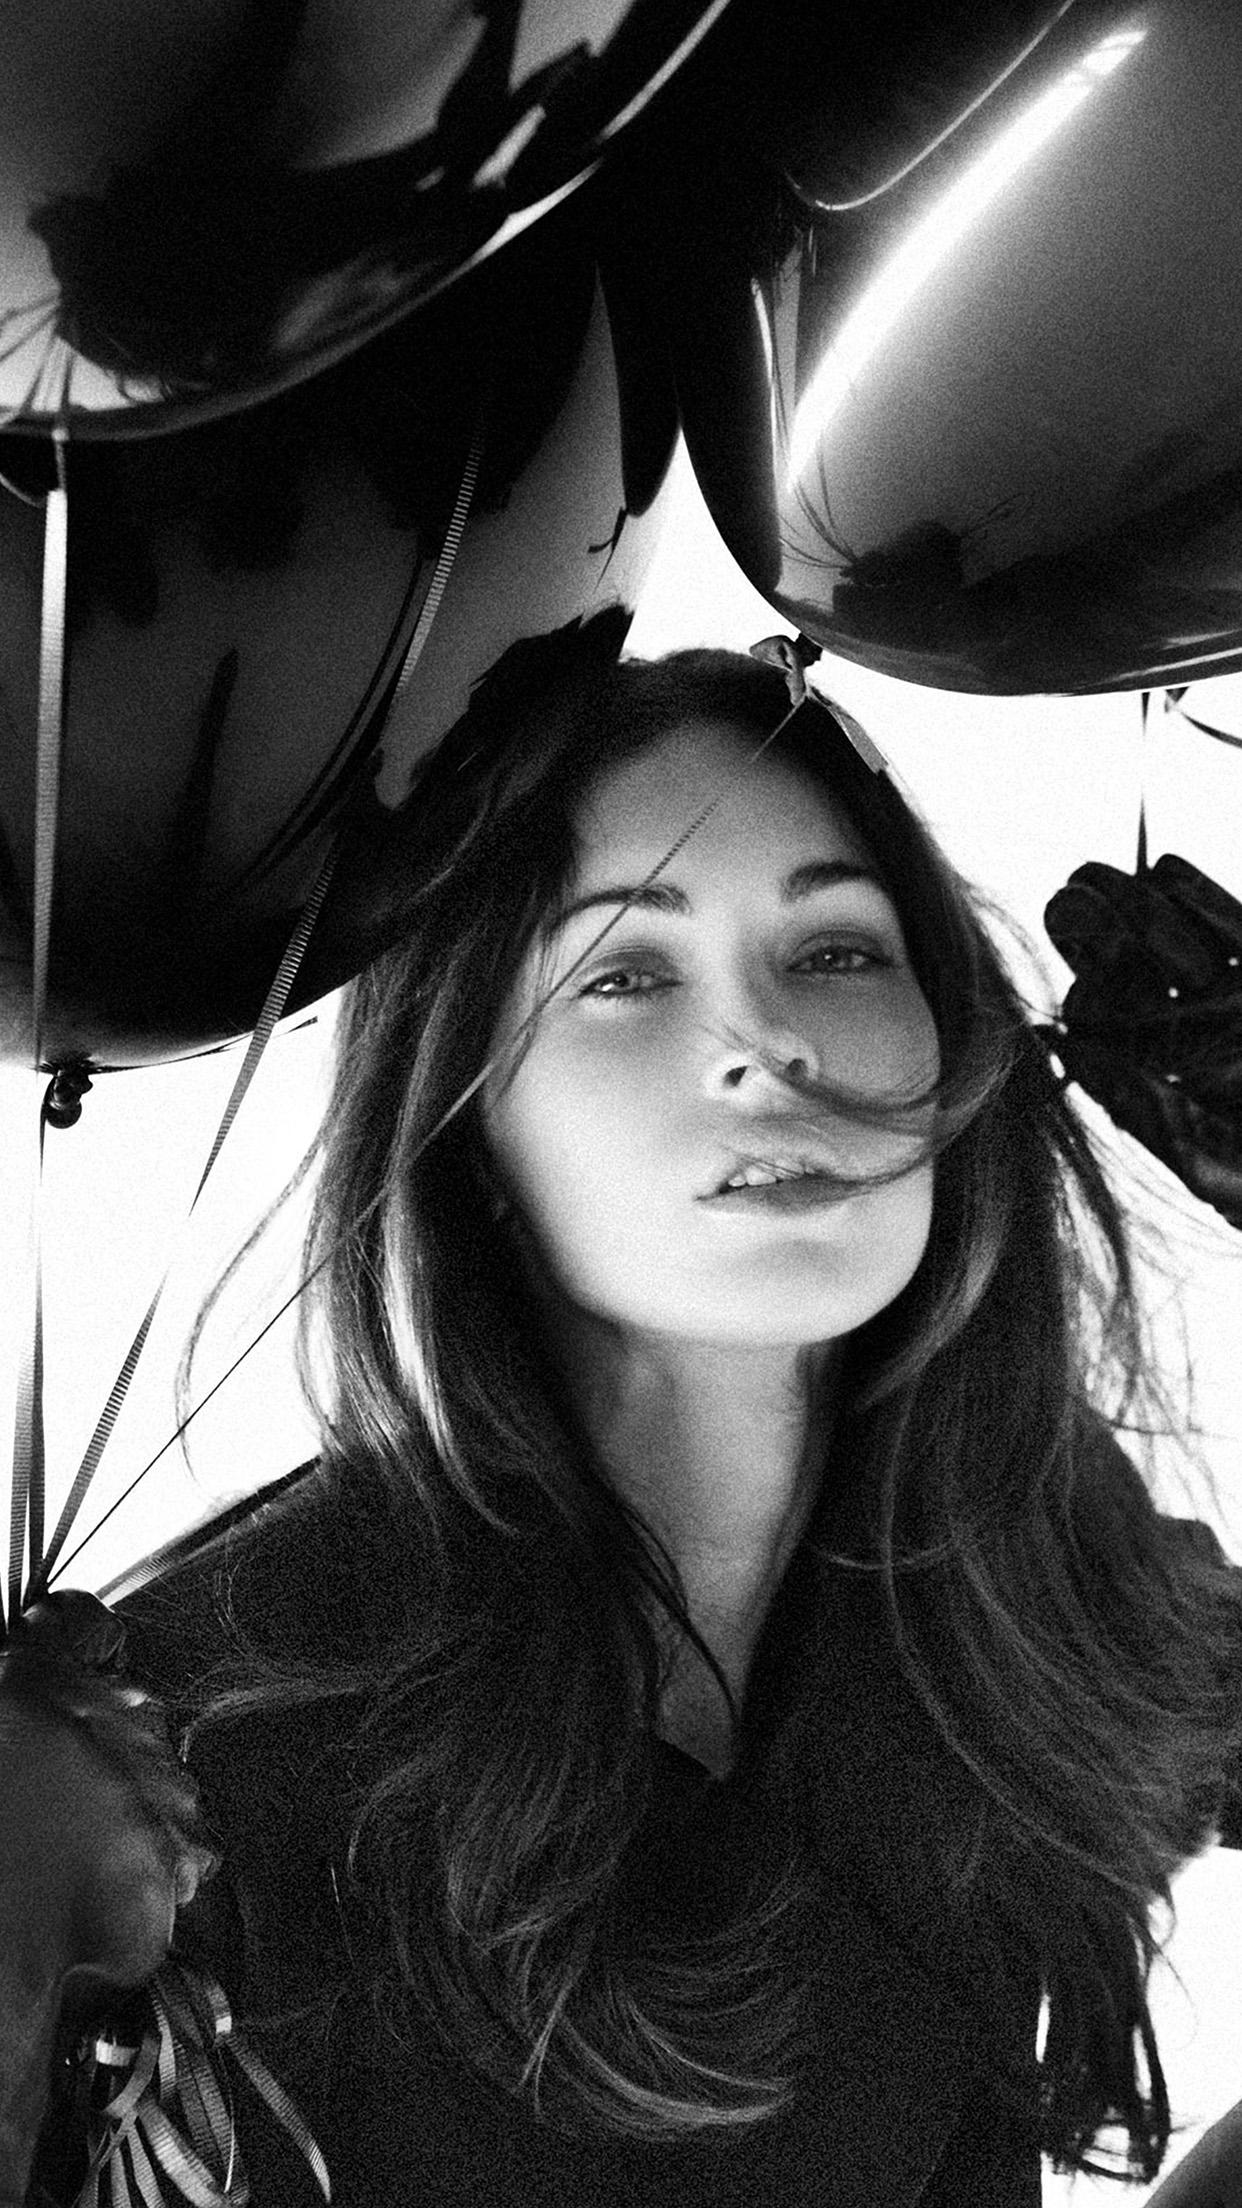 Iphone7papers Hh04 Megan Fox Dark Bw Balloon